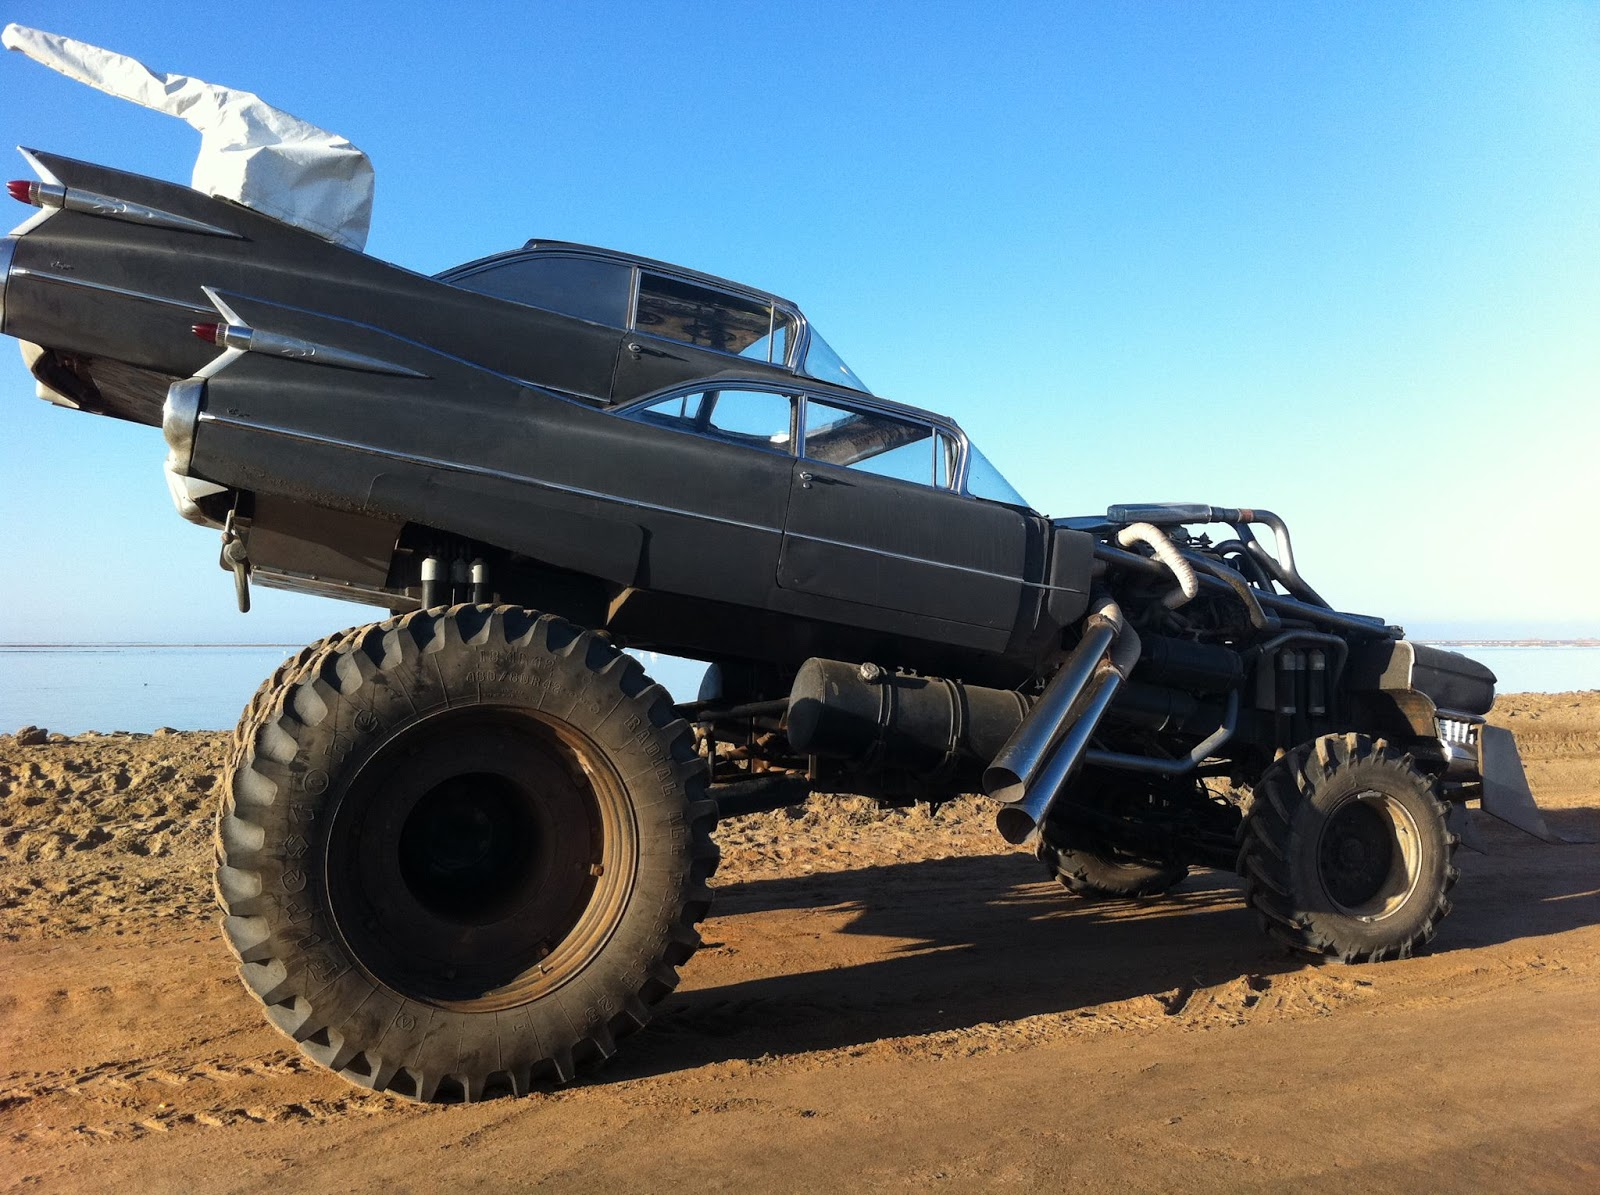 Mad Max Fury Road Cars: Mad Max Fury Road Cars 9